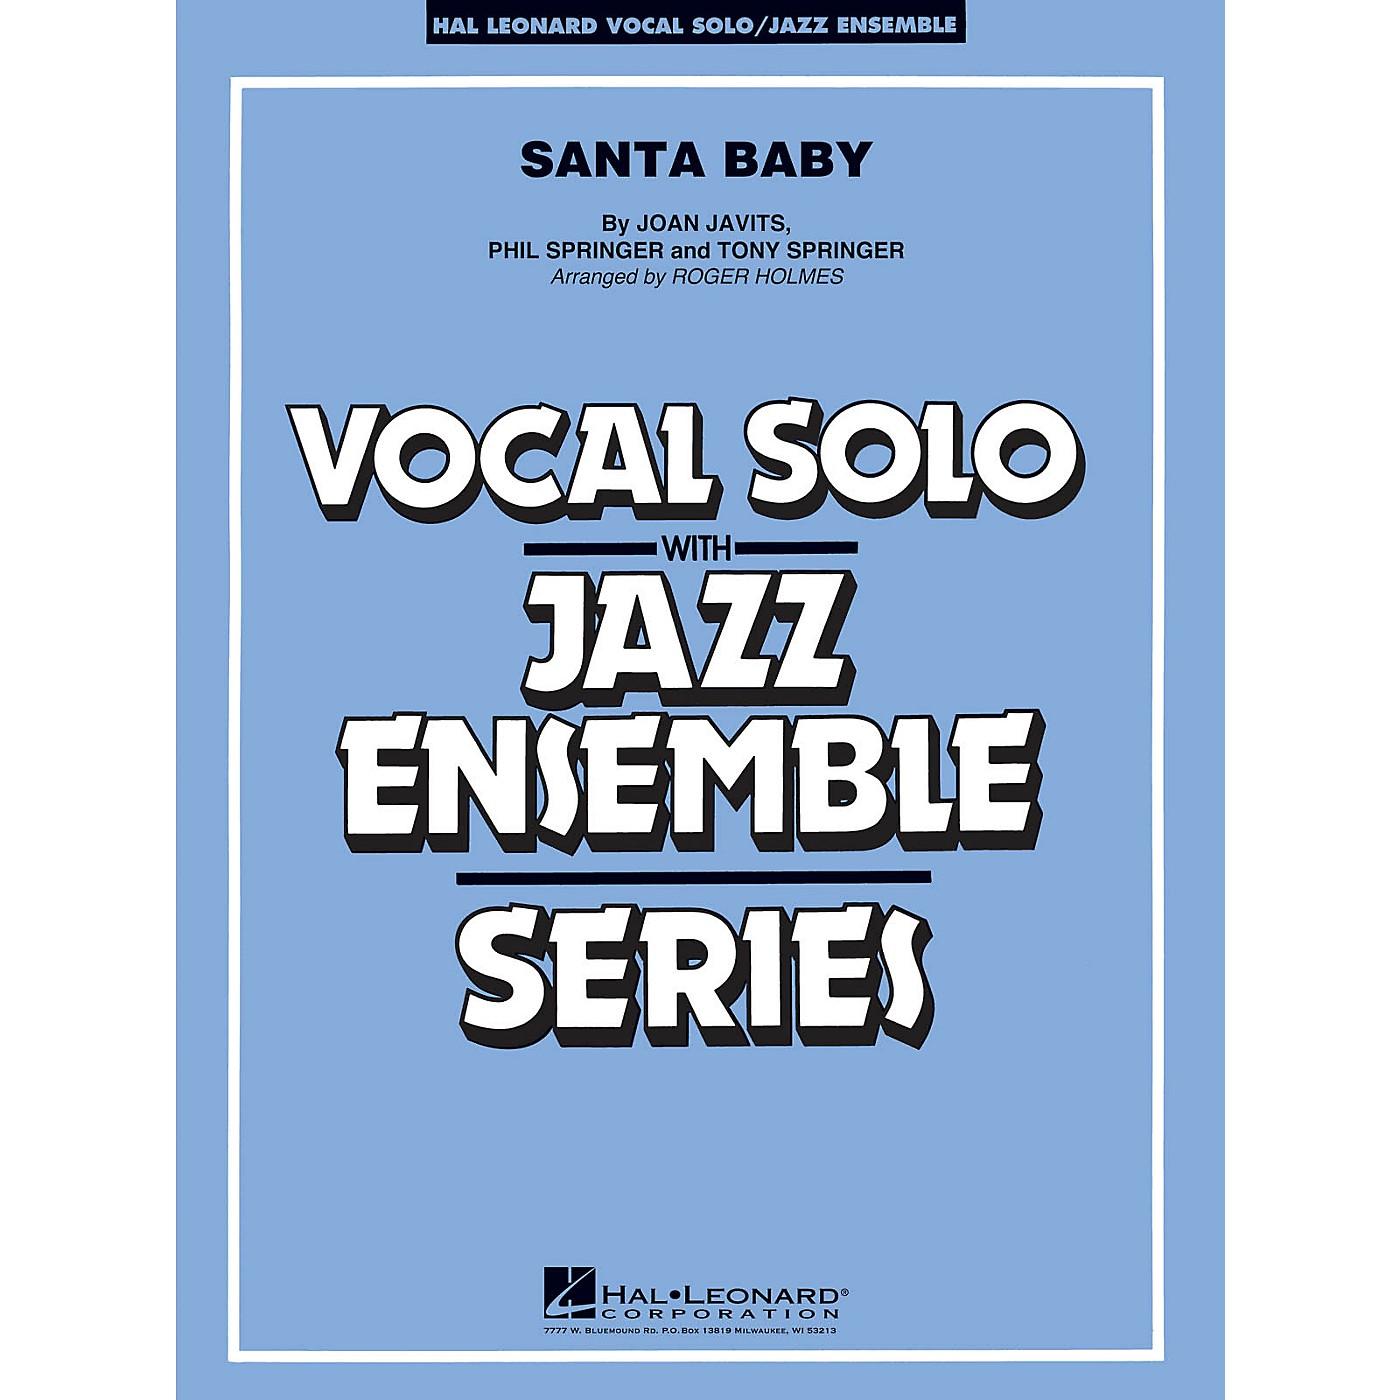 Hal Leonard Santa Baby - Vocal Solo Jazz Ensemble Series Level 4 thumbnail